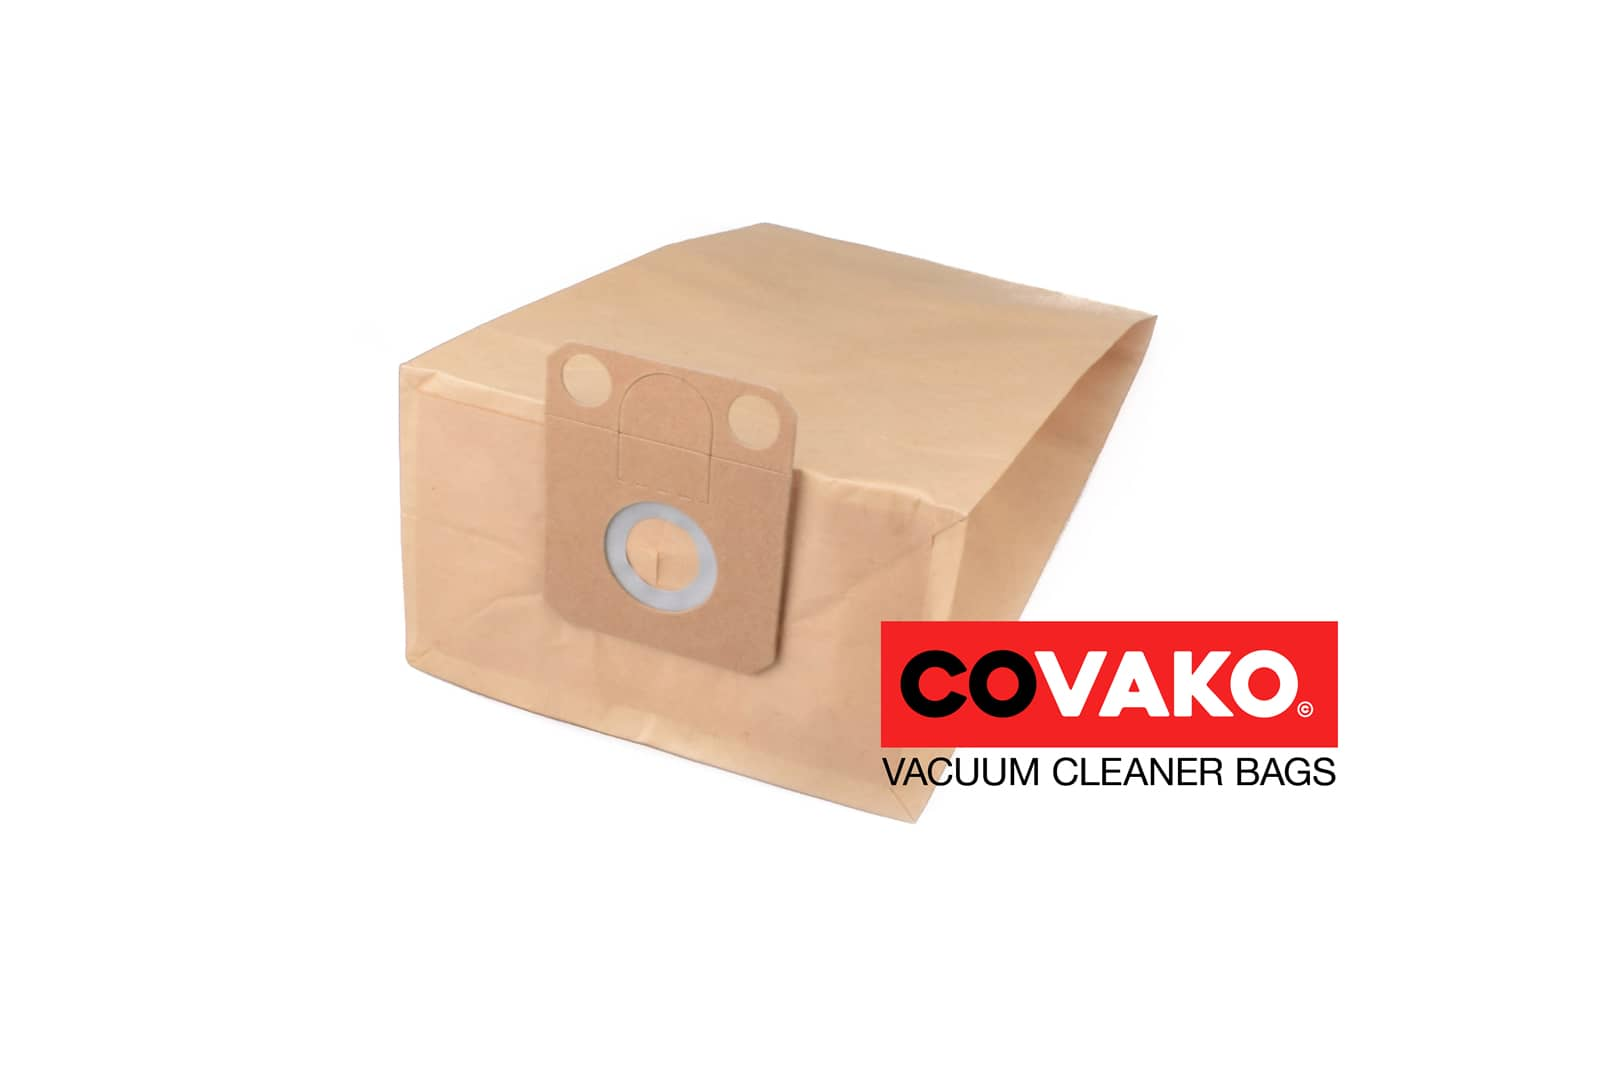 Alto VP 100 EU / Papier - Alto sacs d'aspirateur